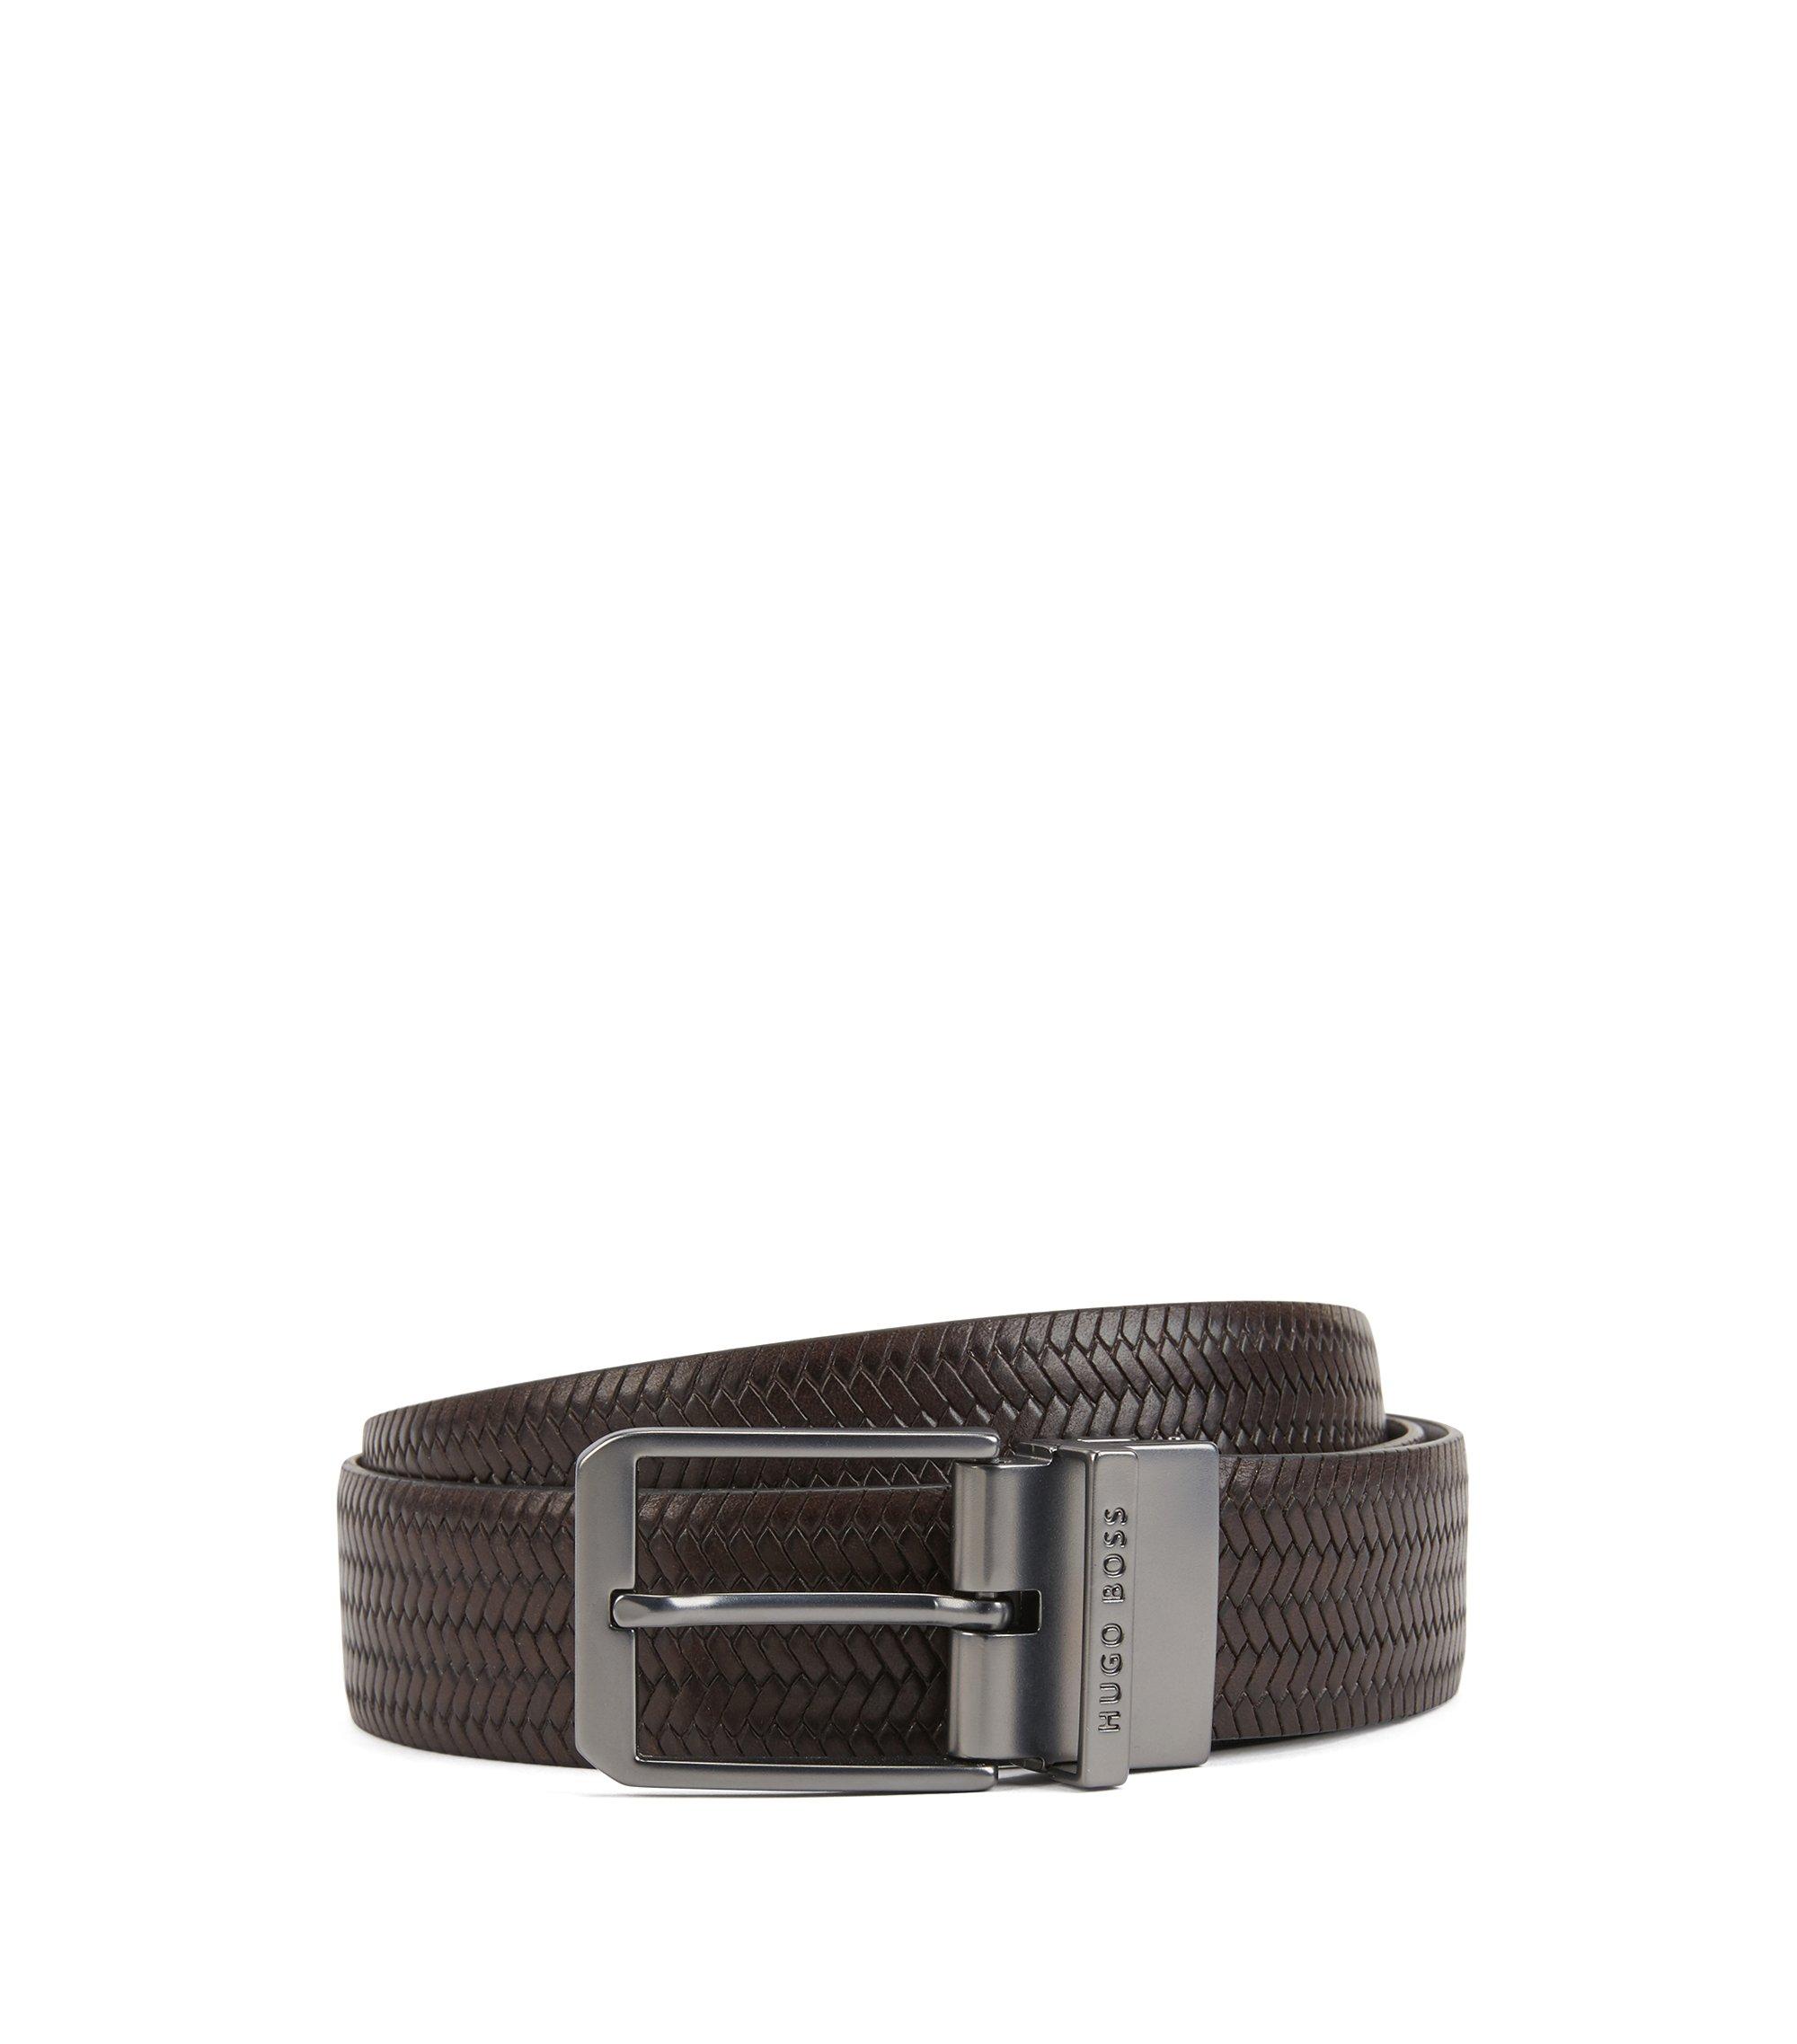 Reversible leather belt with matte gunmetal hardware, Dark Brown